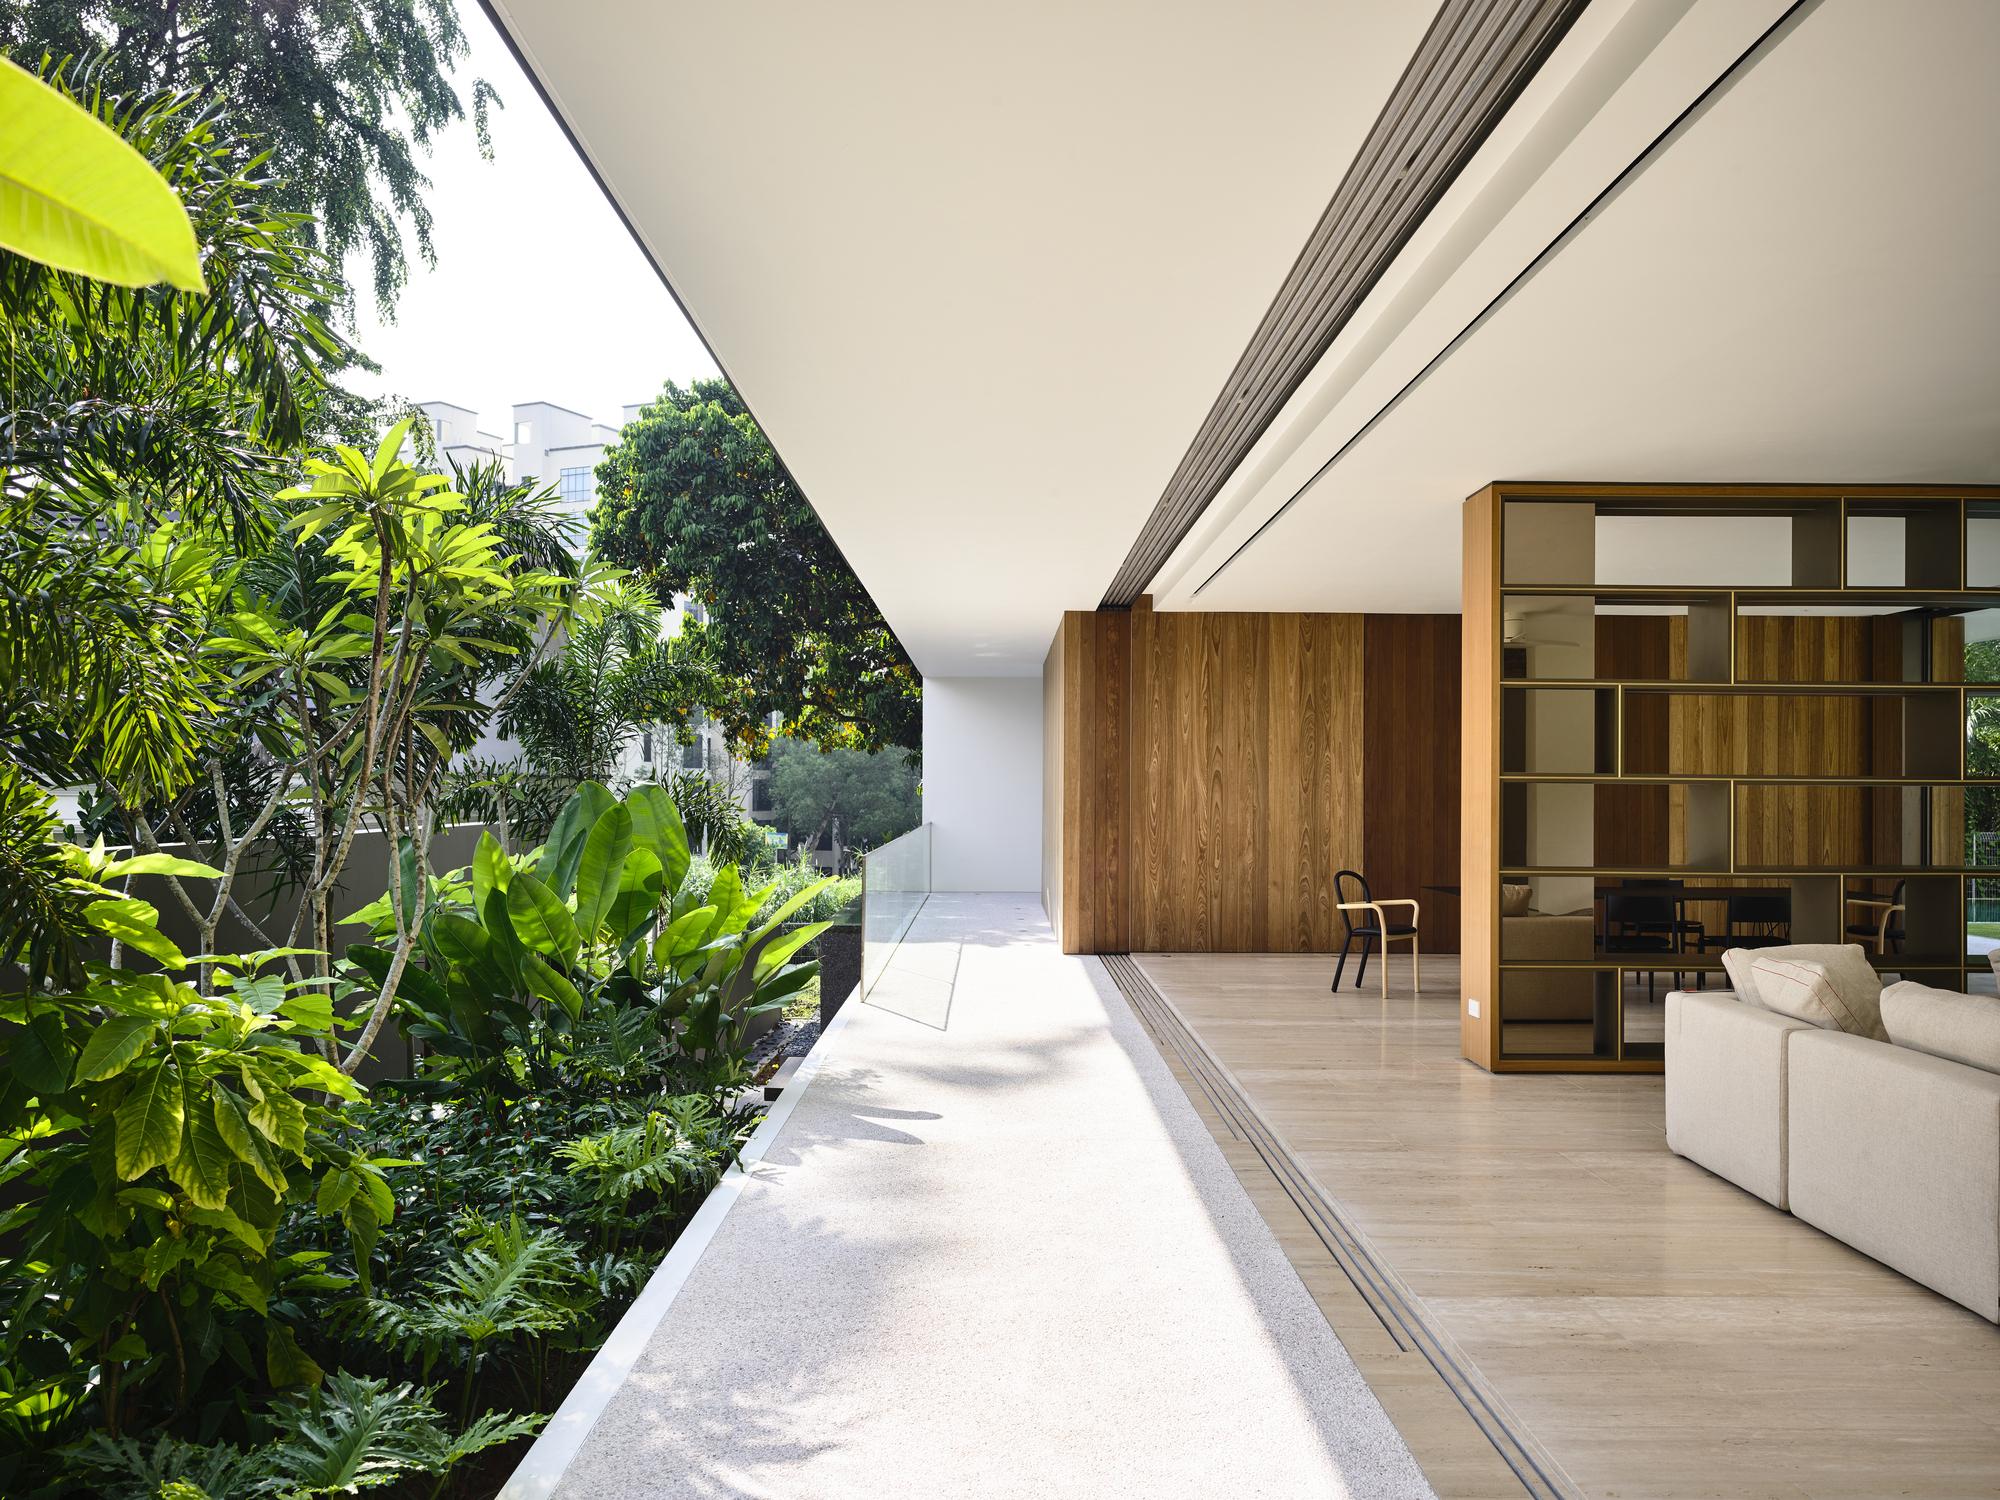 Galeria de resid ncia kap ong ong pte ltd 3 for Indoor nature design challenge